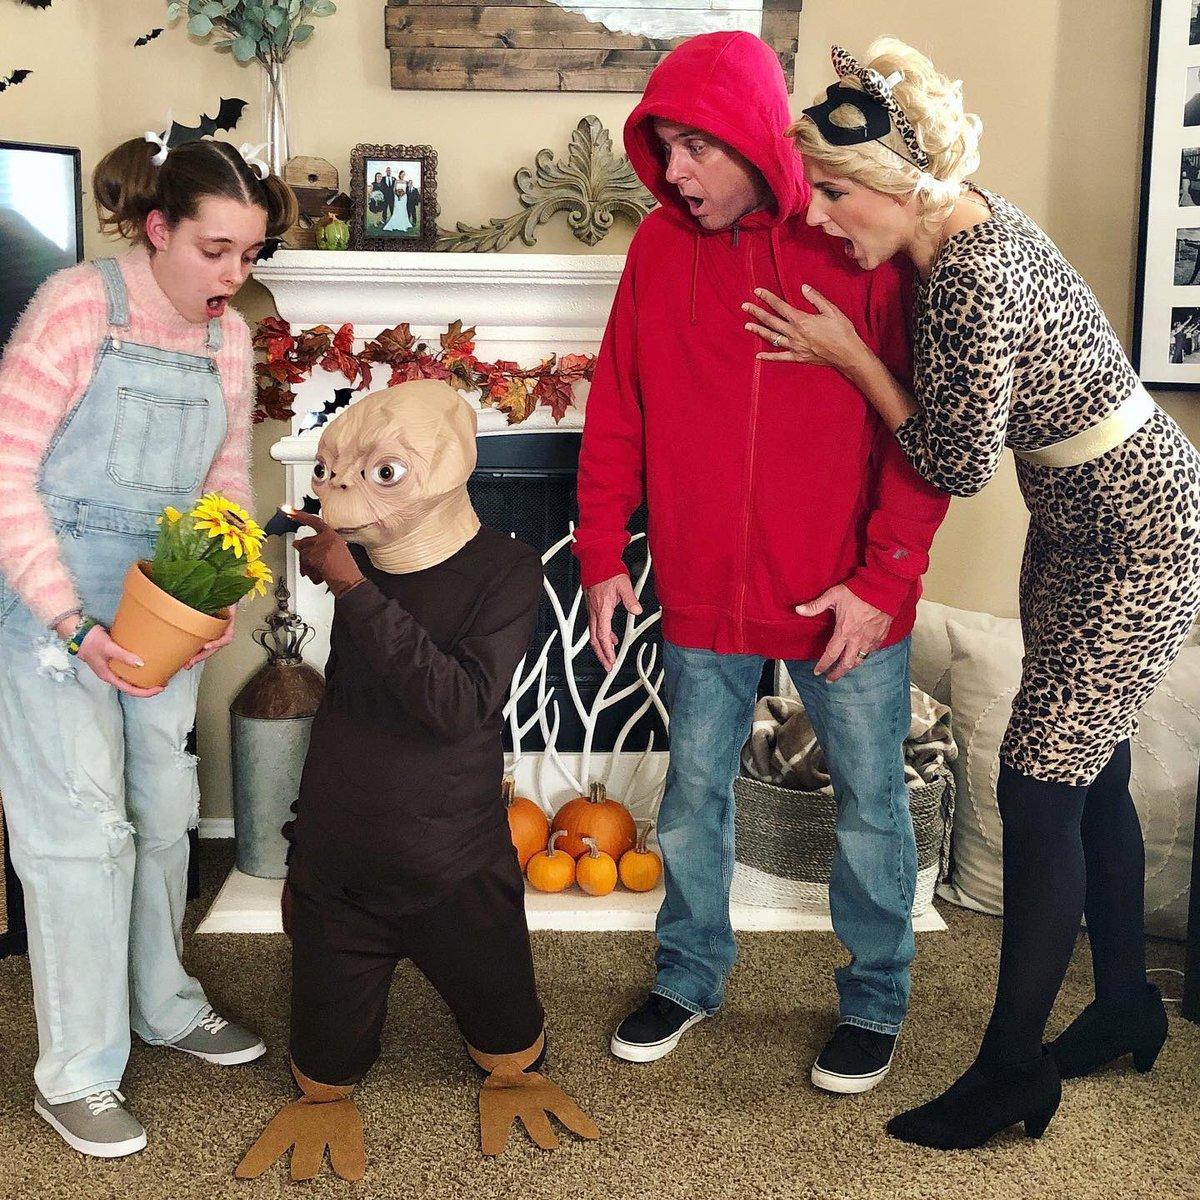 Happy Halloween! 🎃 #familycostume #halloween2020 #ettheextraterrestrial #family